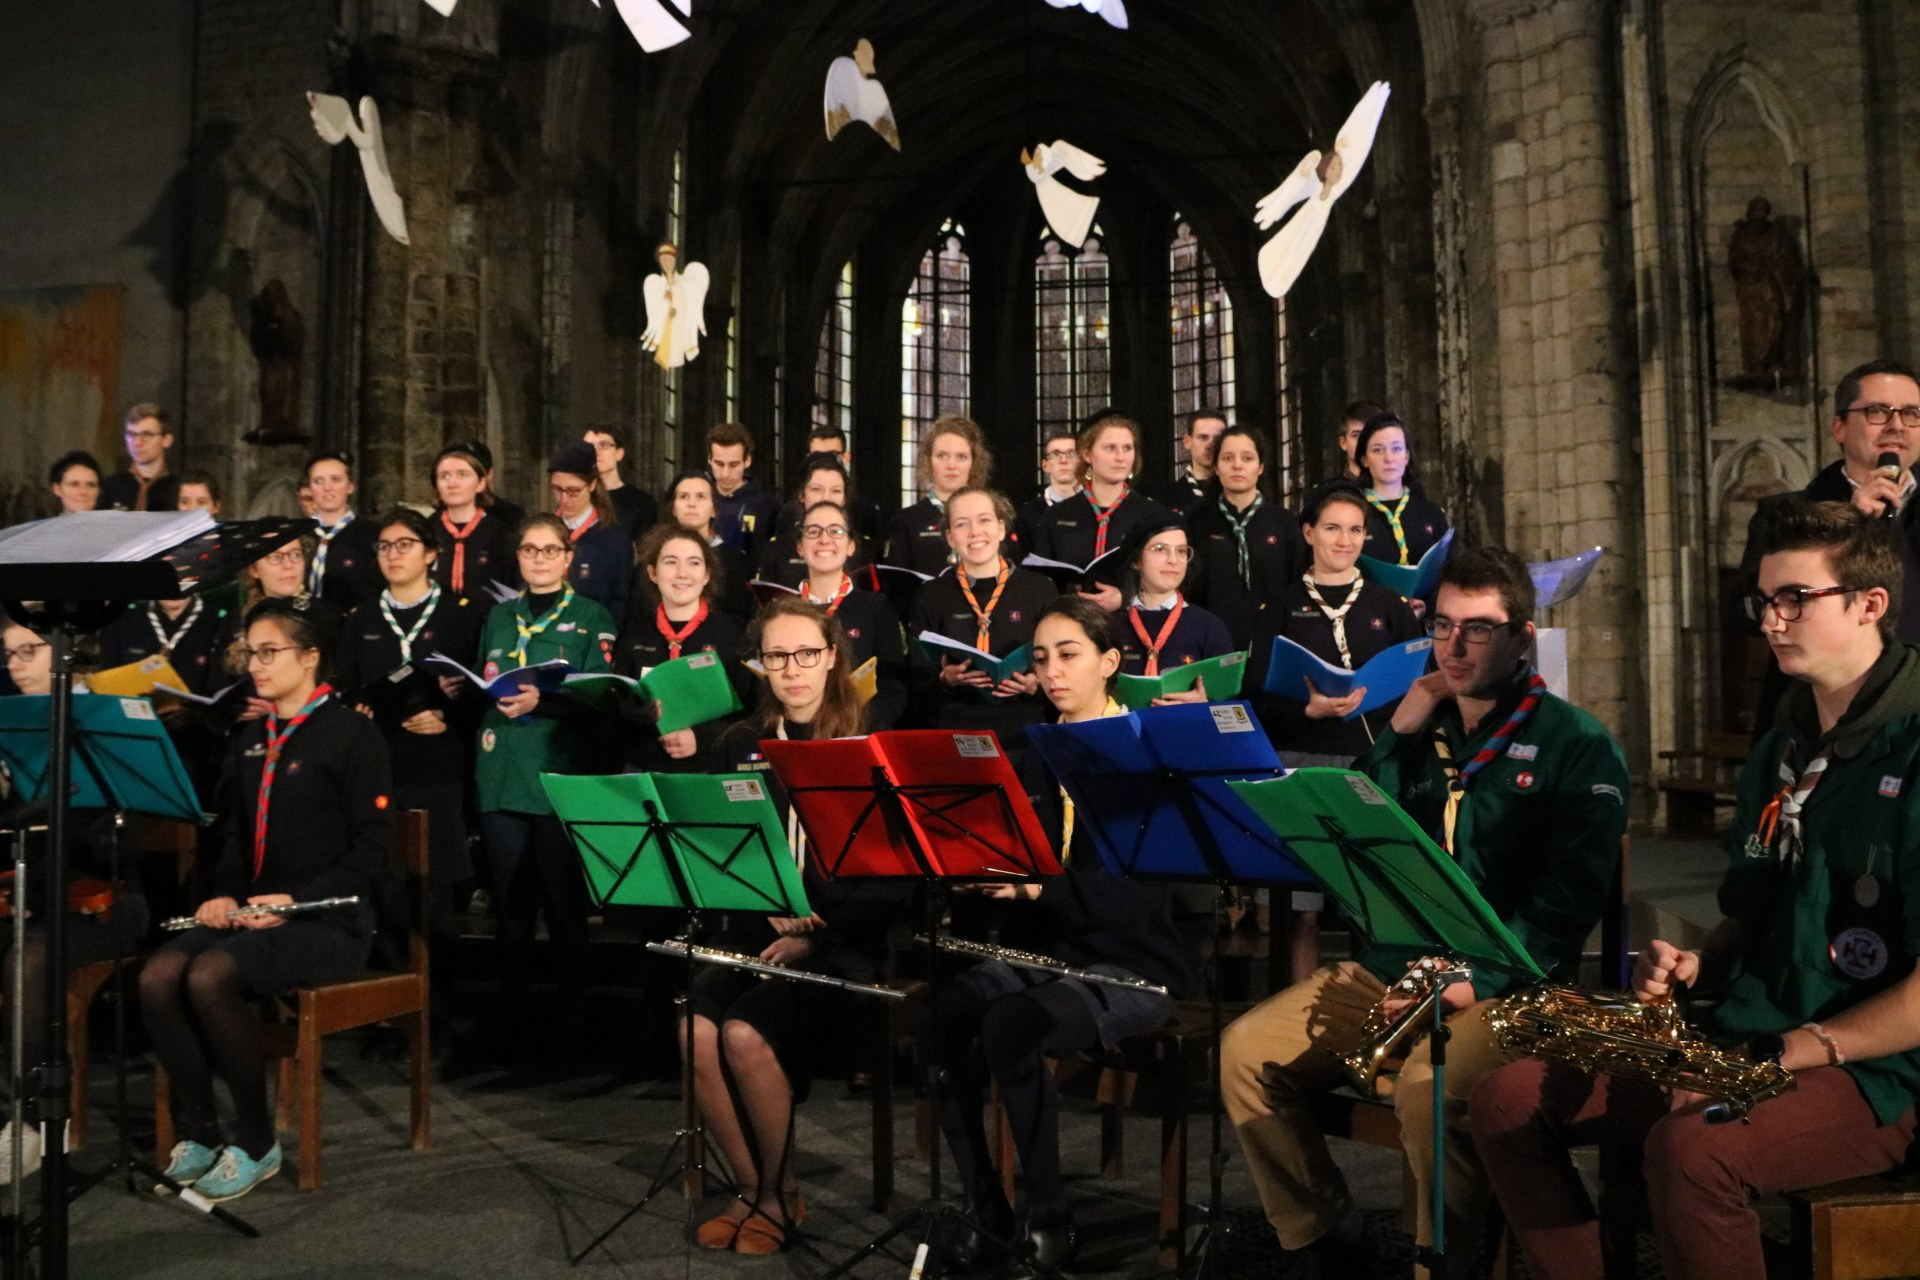 1812_Concert de Noël 4